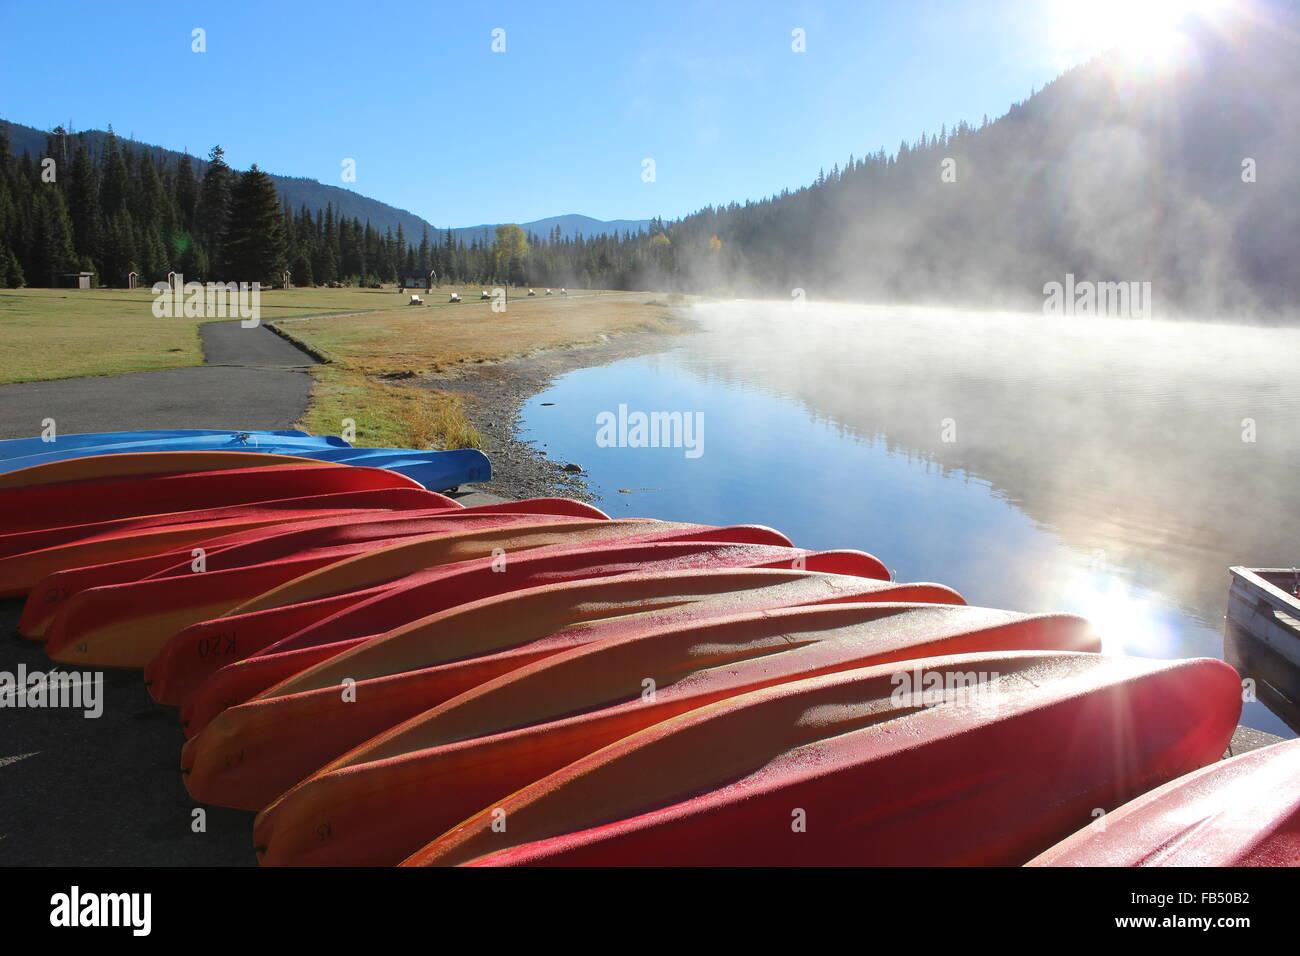 Early Morning Canoe Ride at the Lake - Stock Image